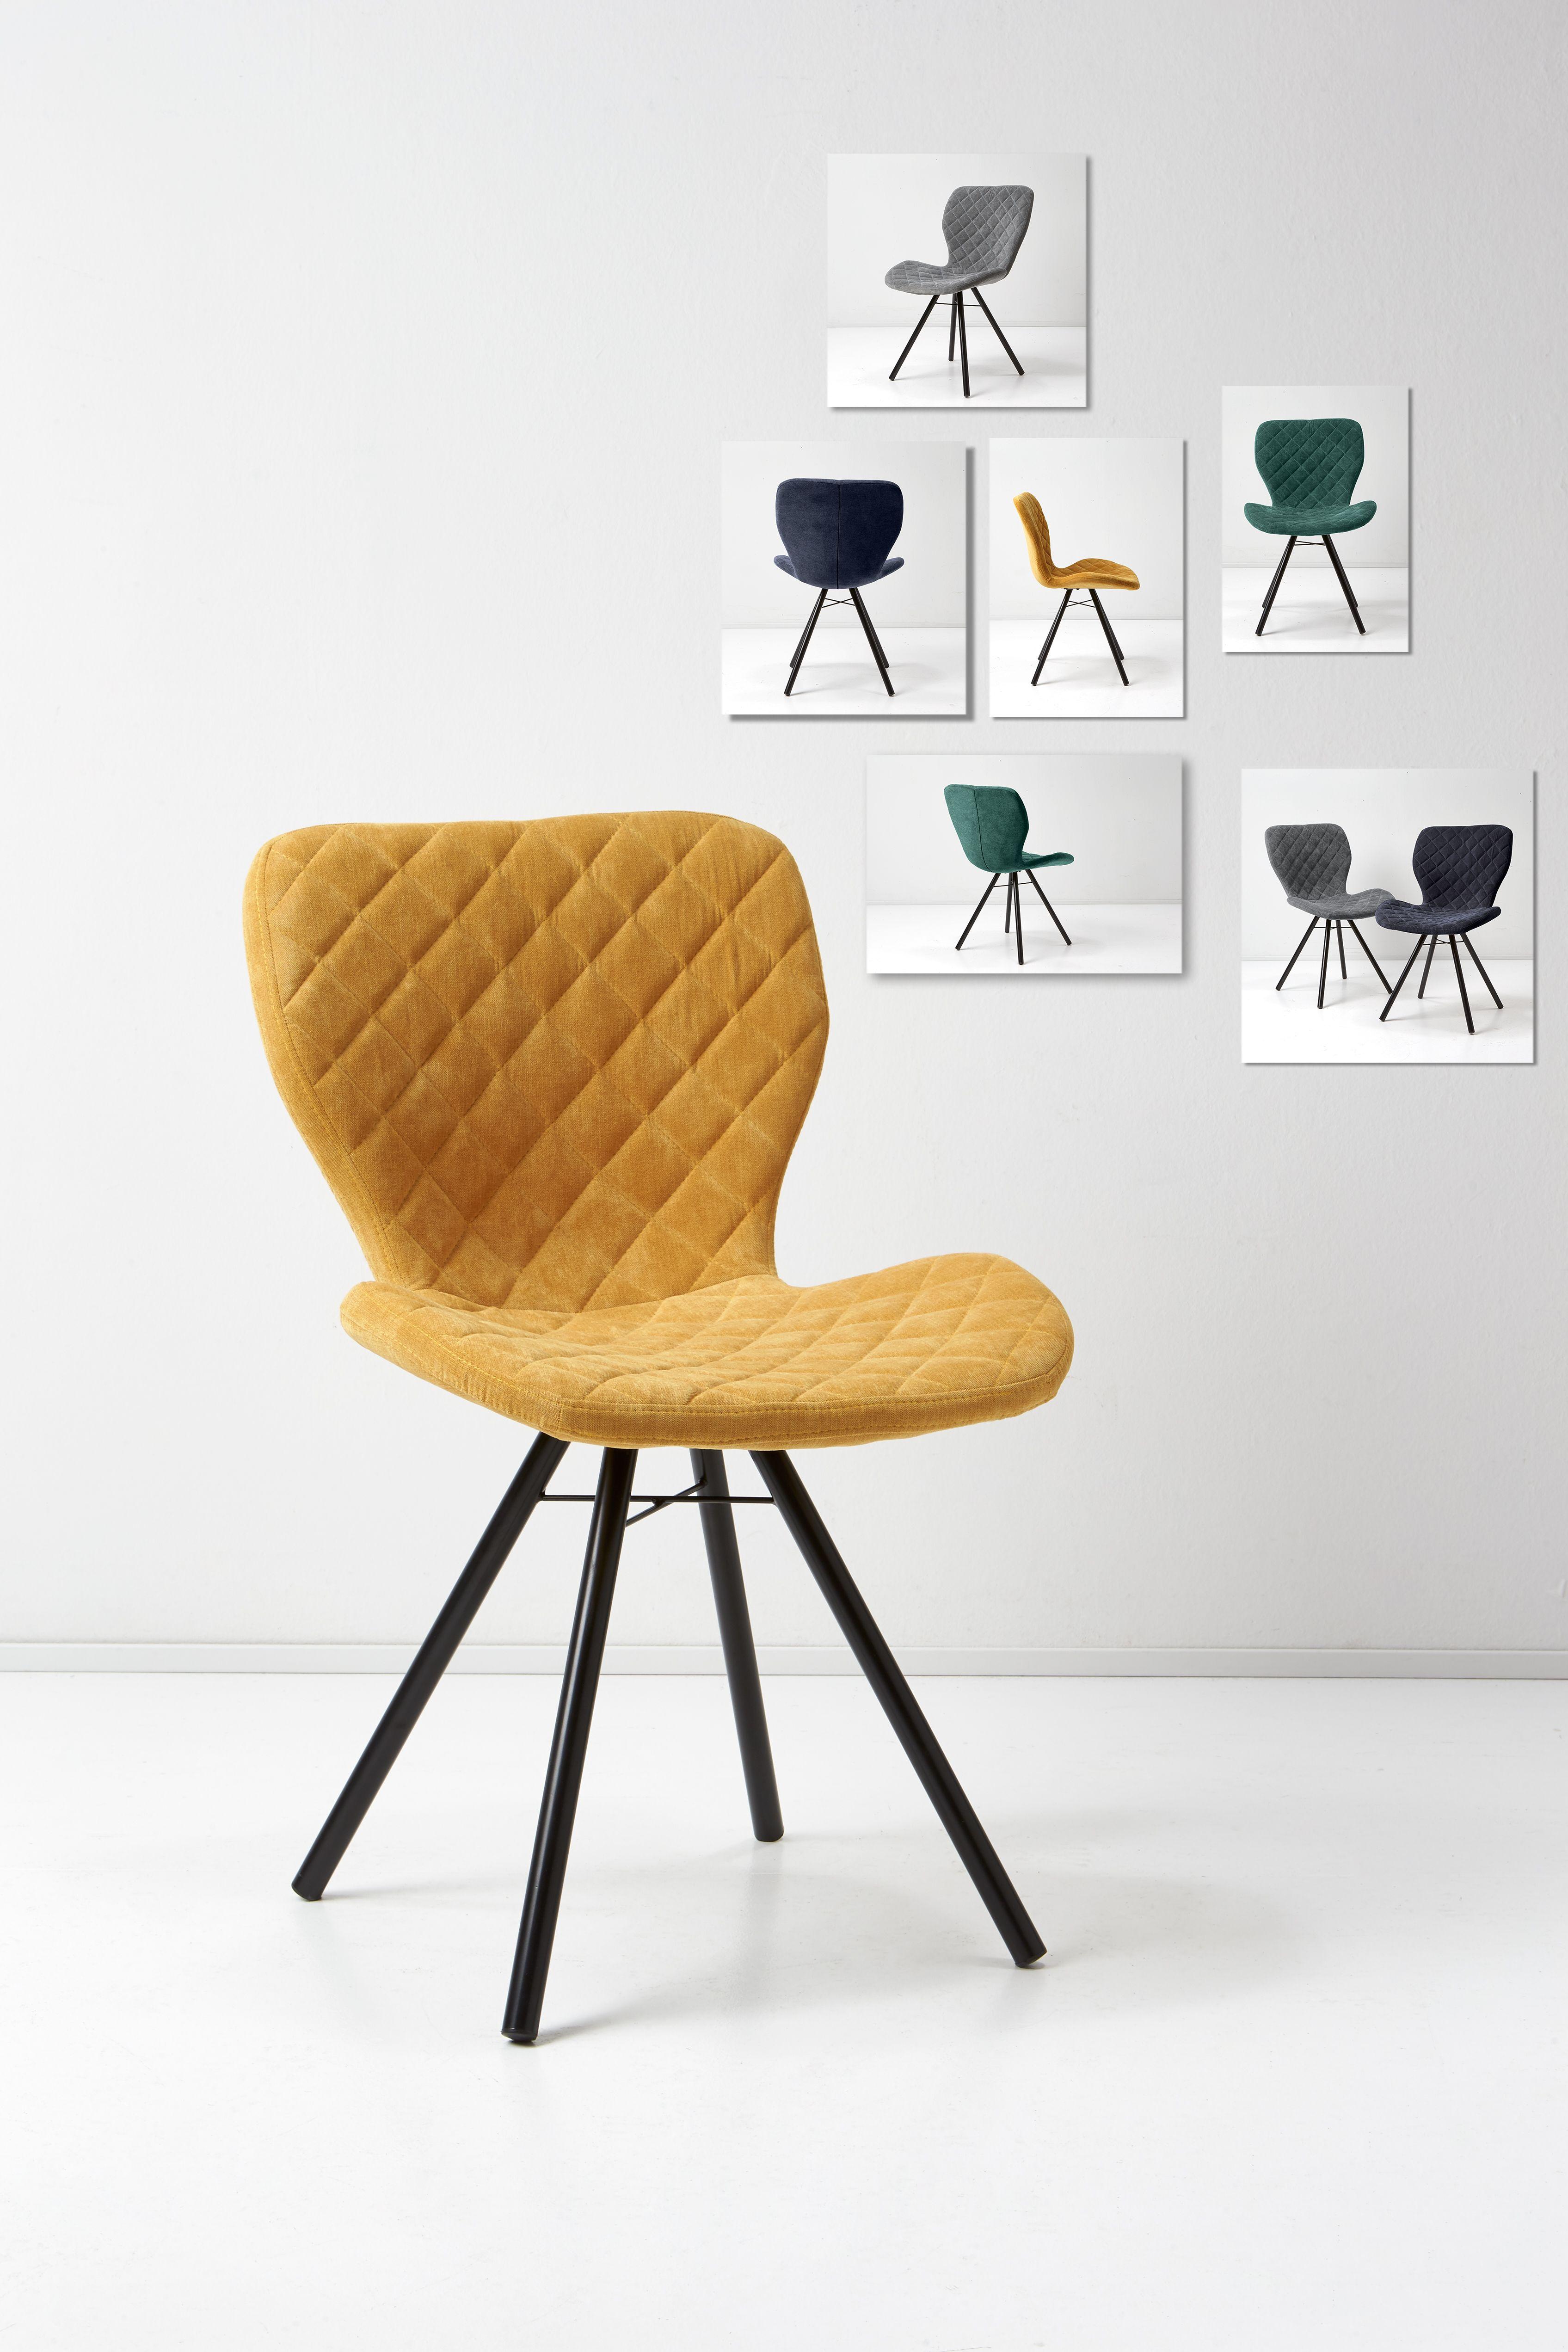 Stoelen Eetkamer Goedkoop.Dit Is M Dan Onze Nieuwe Moderne Vlinderstoel Lucca Je